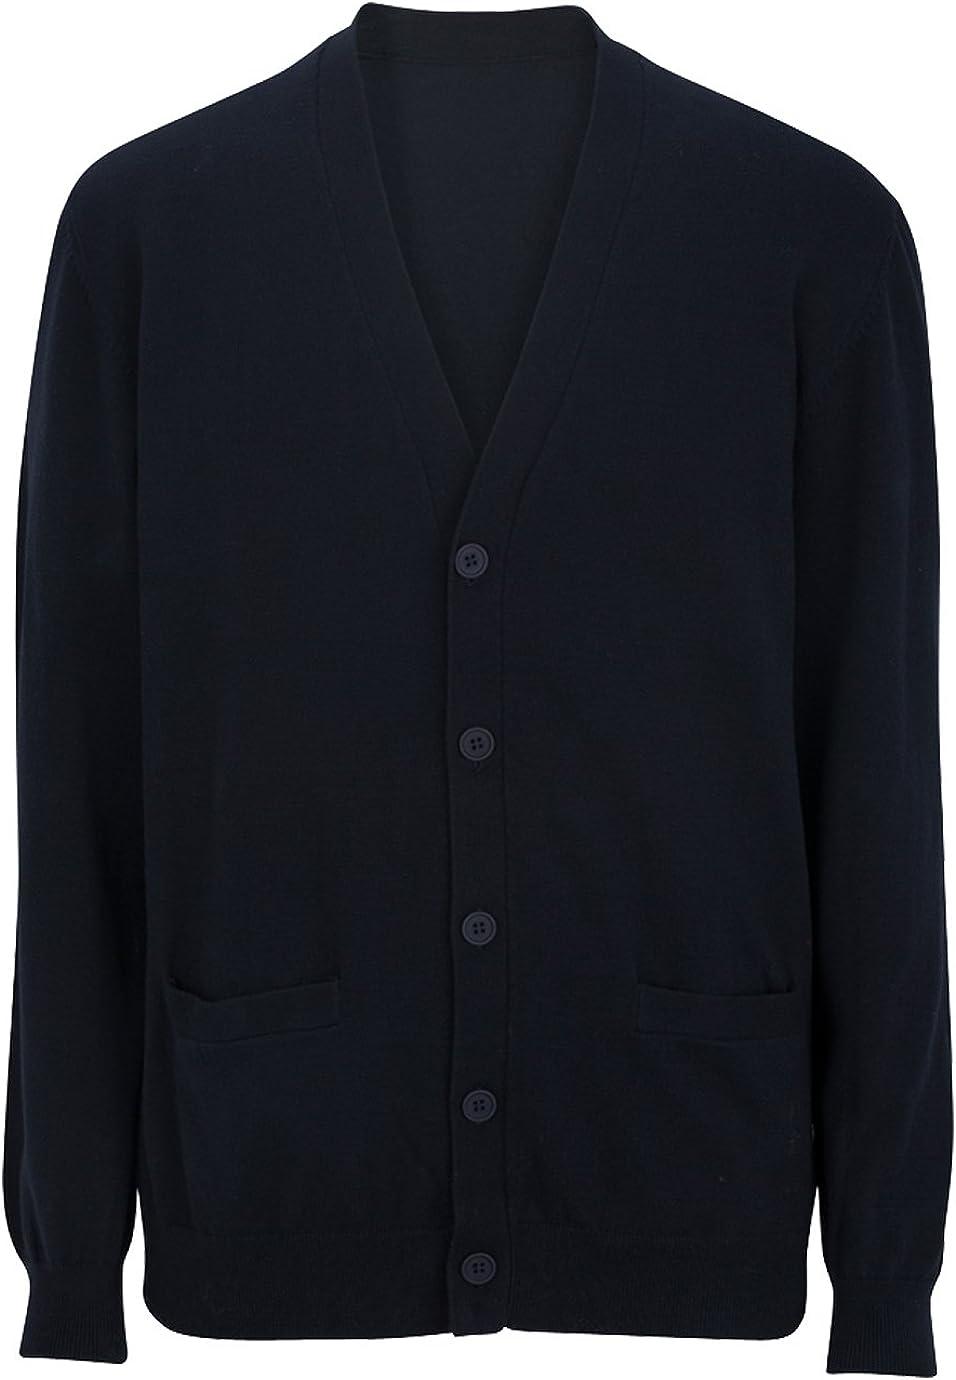 Ed Garments V-Neck Cotton Blend Cardigan-2Pockets